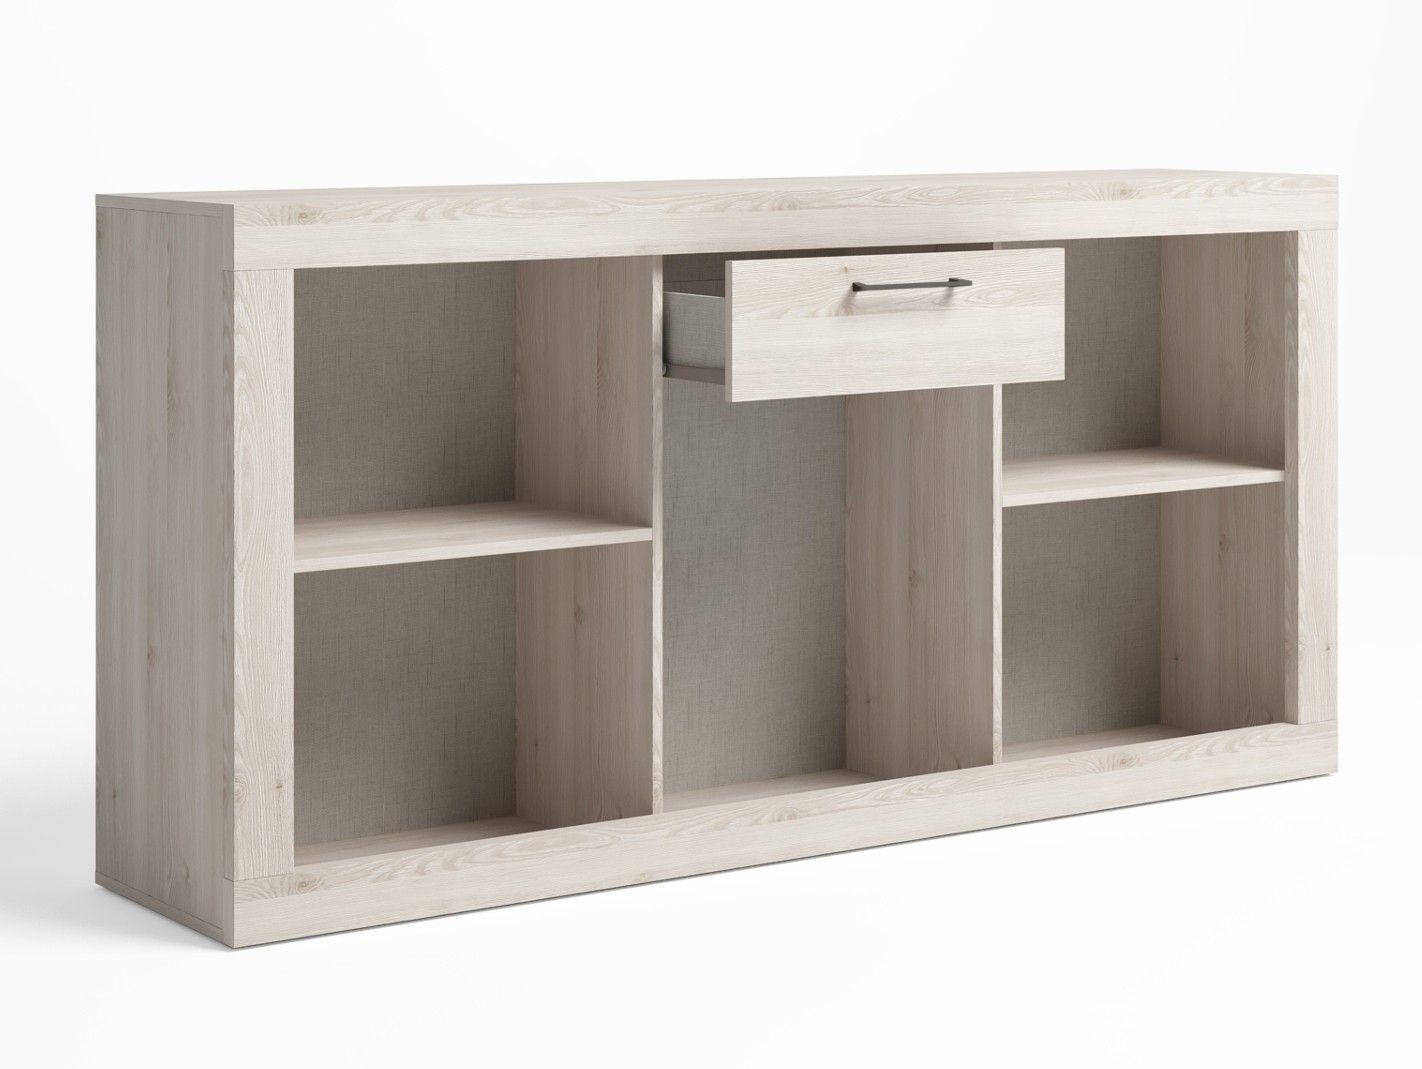 Muebles dormitorio juvenil moderno 20170723215141 - Fotos de cuartos juveniles ...